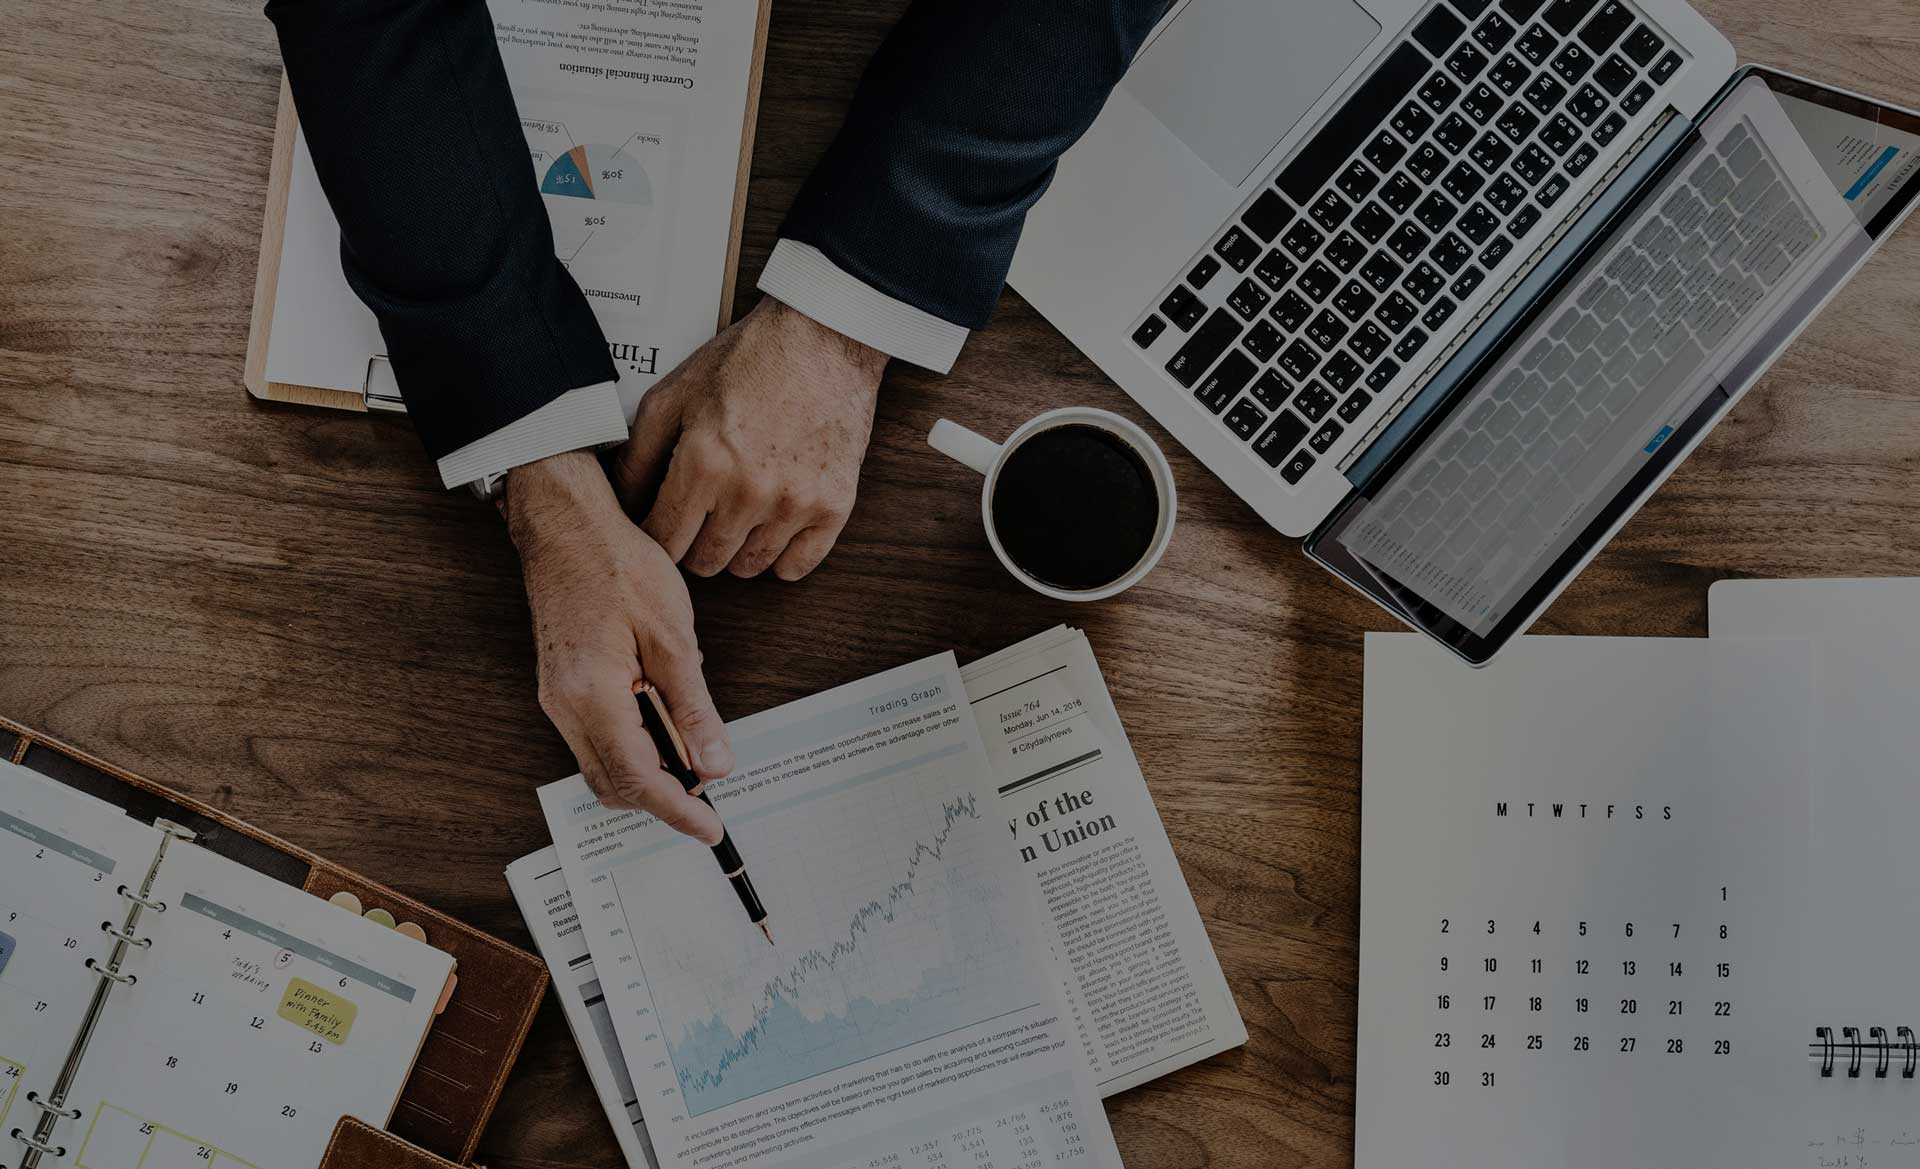 agenda-analysis-business-plan-990818-copy